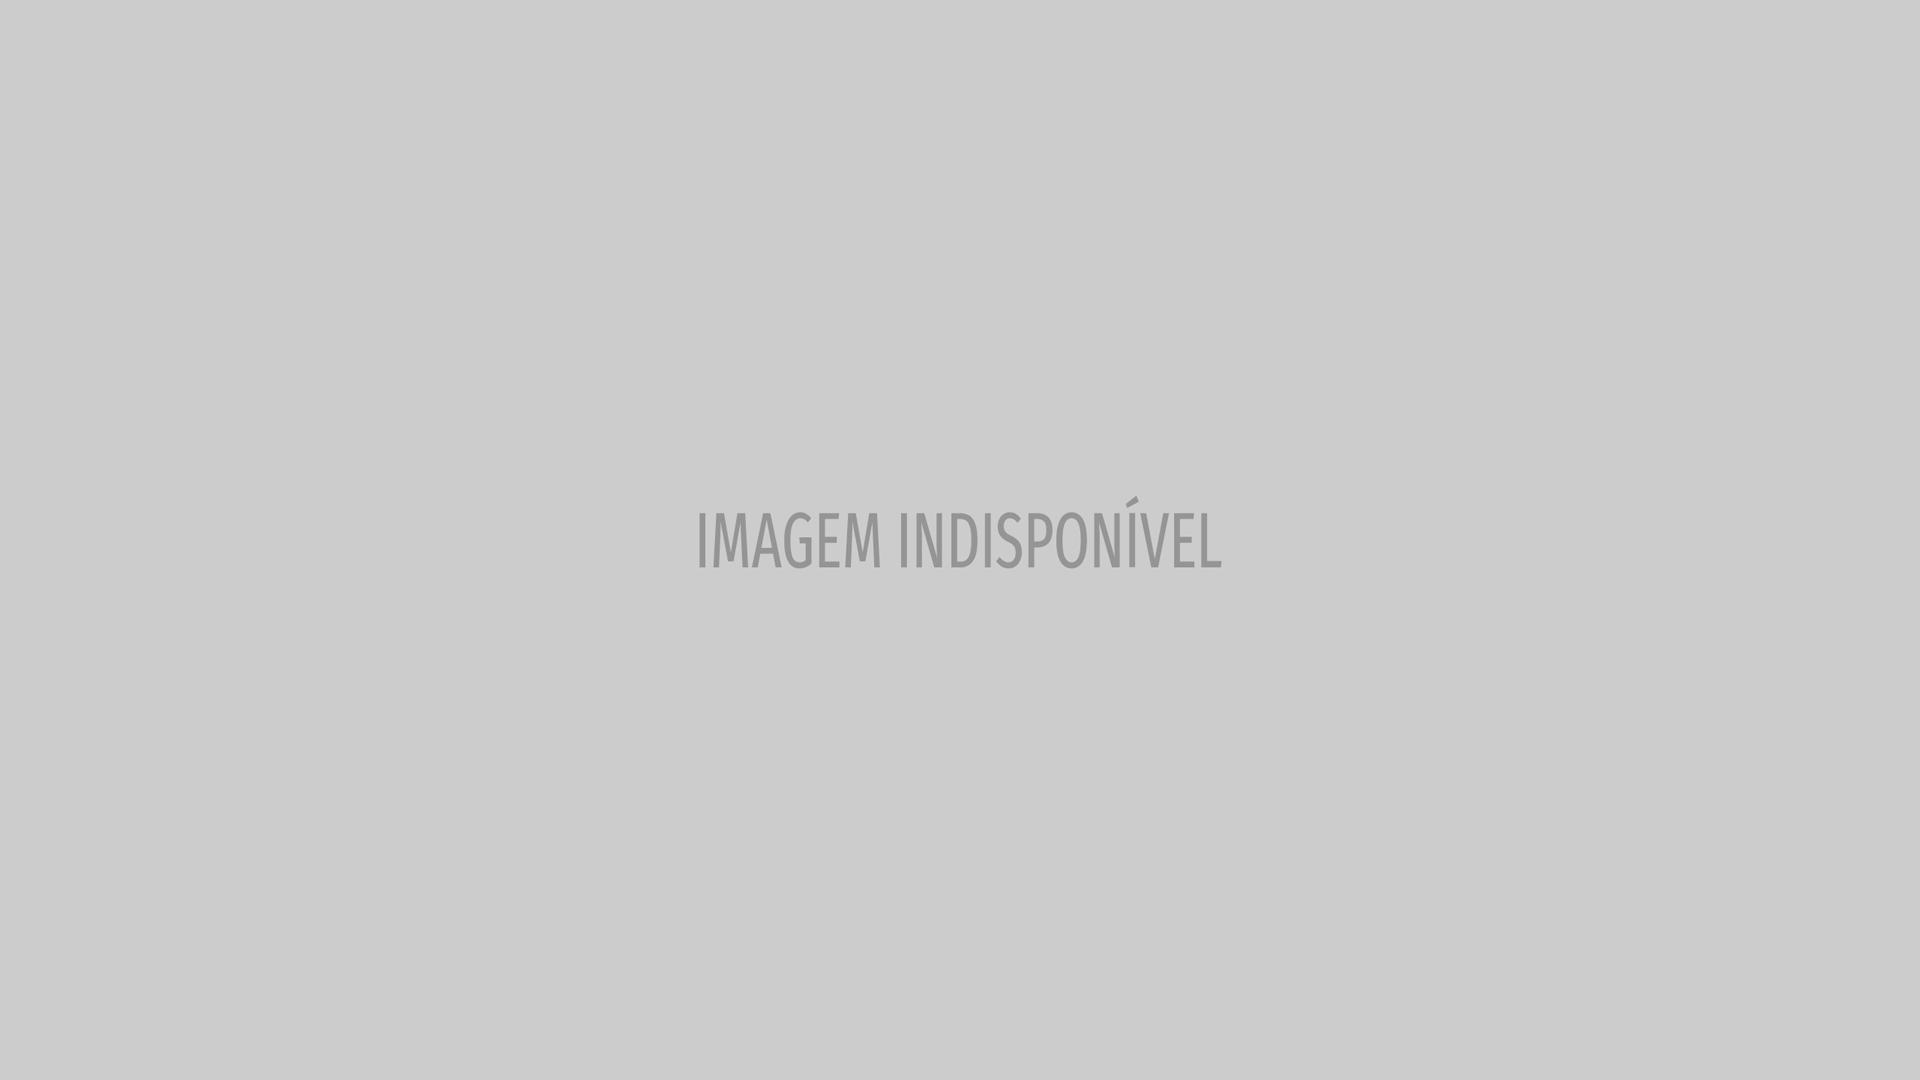 Modelo Viviane Orth será nova capa da Playboy